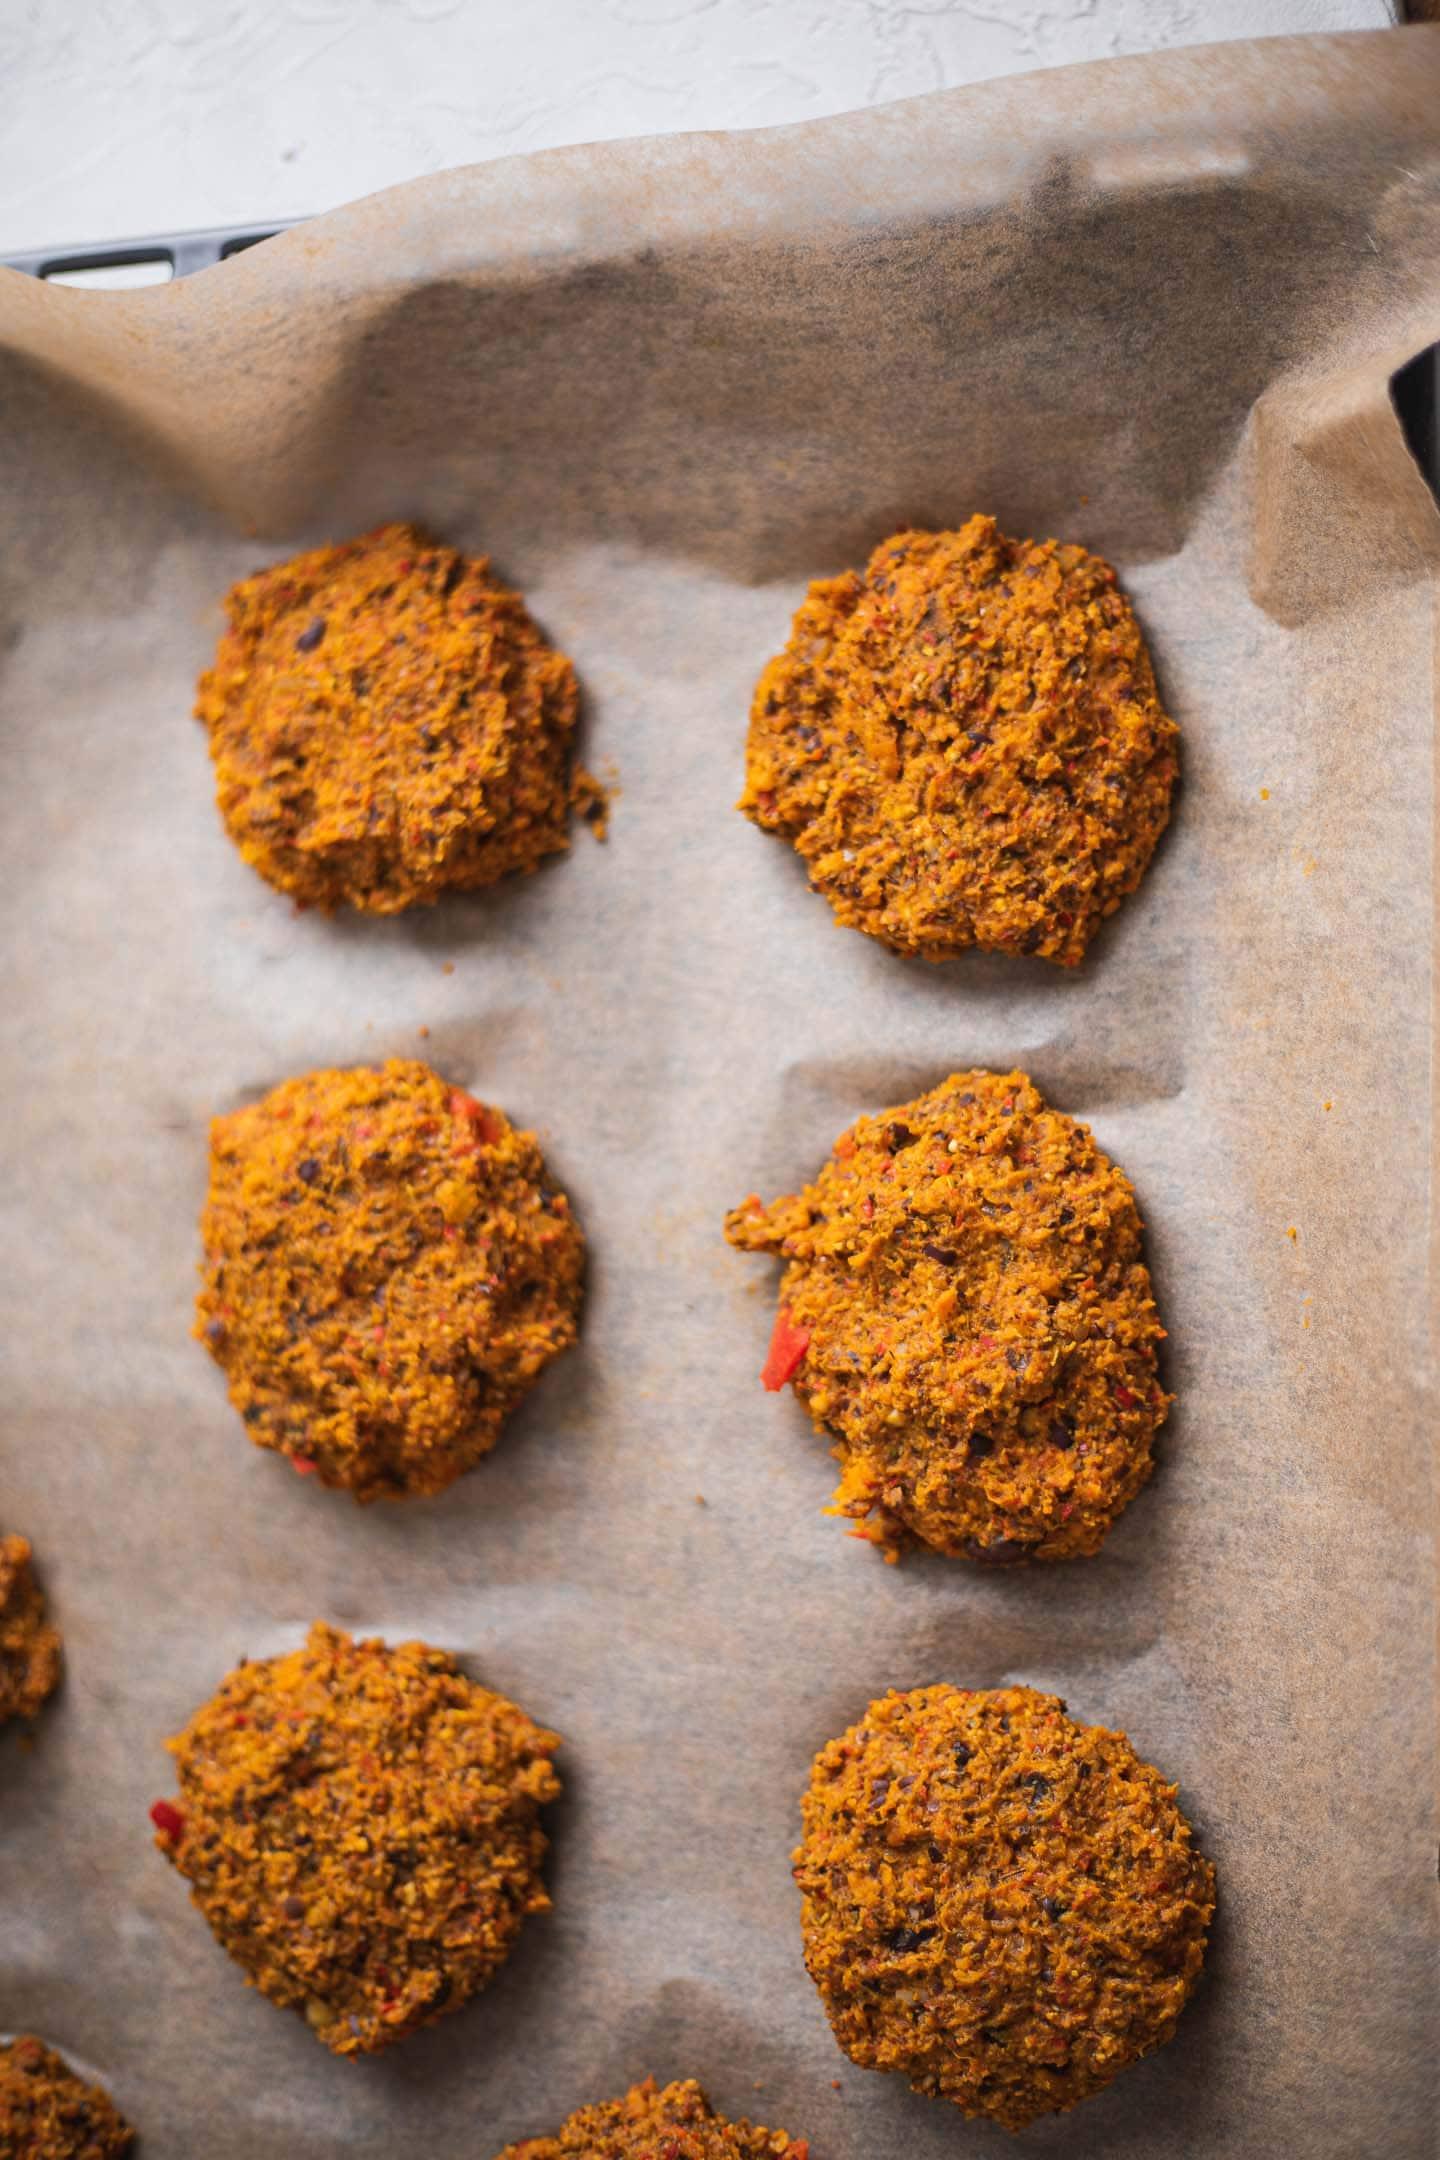 Vegan burgers on a baking tray